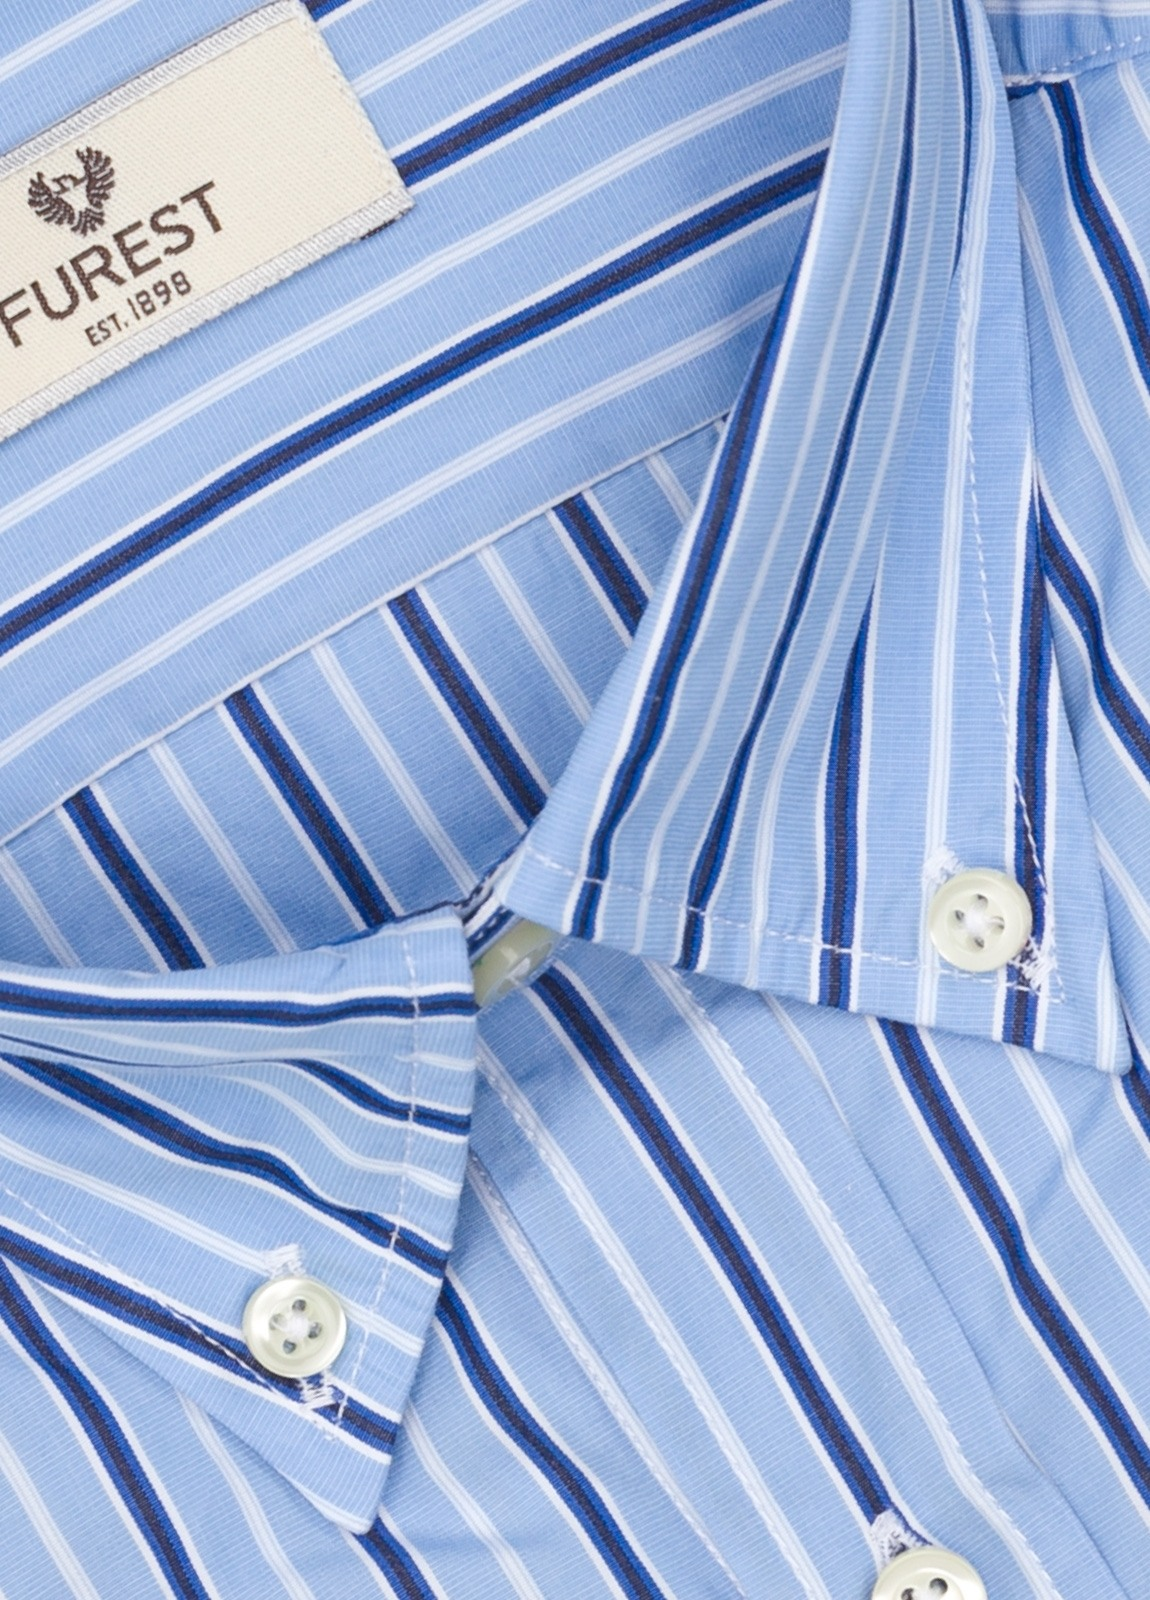 Camisa Leisure Wear SLIM FIT Modelo BOTTON DOWN color azul celeste, estampado rayas azul. 100% Algodón. - Ítem1